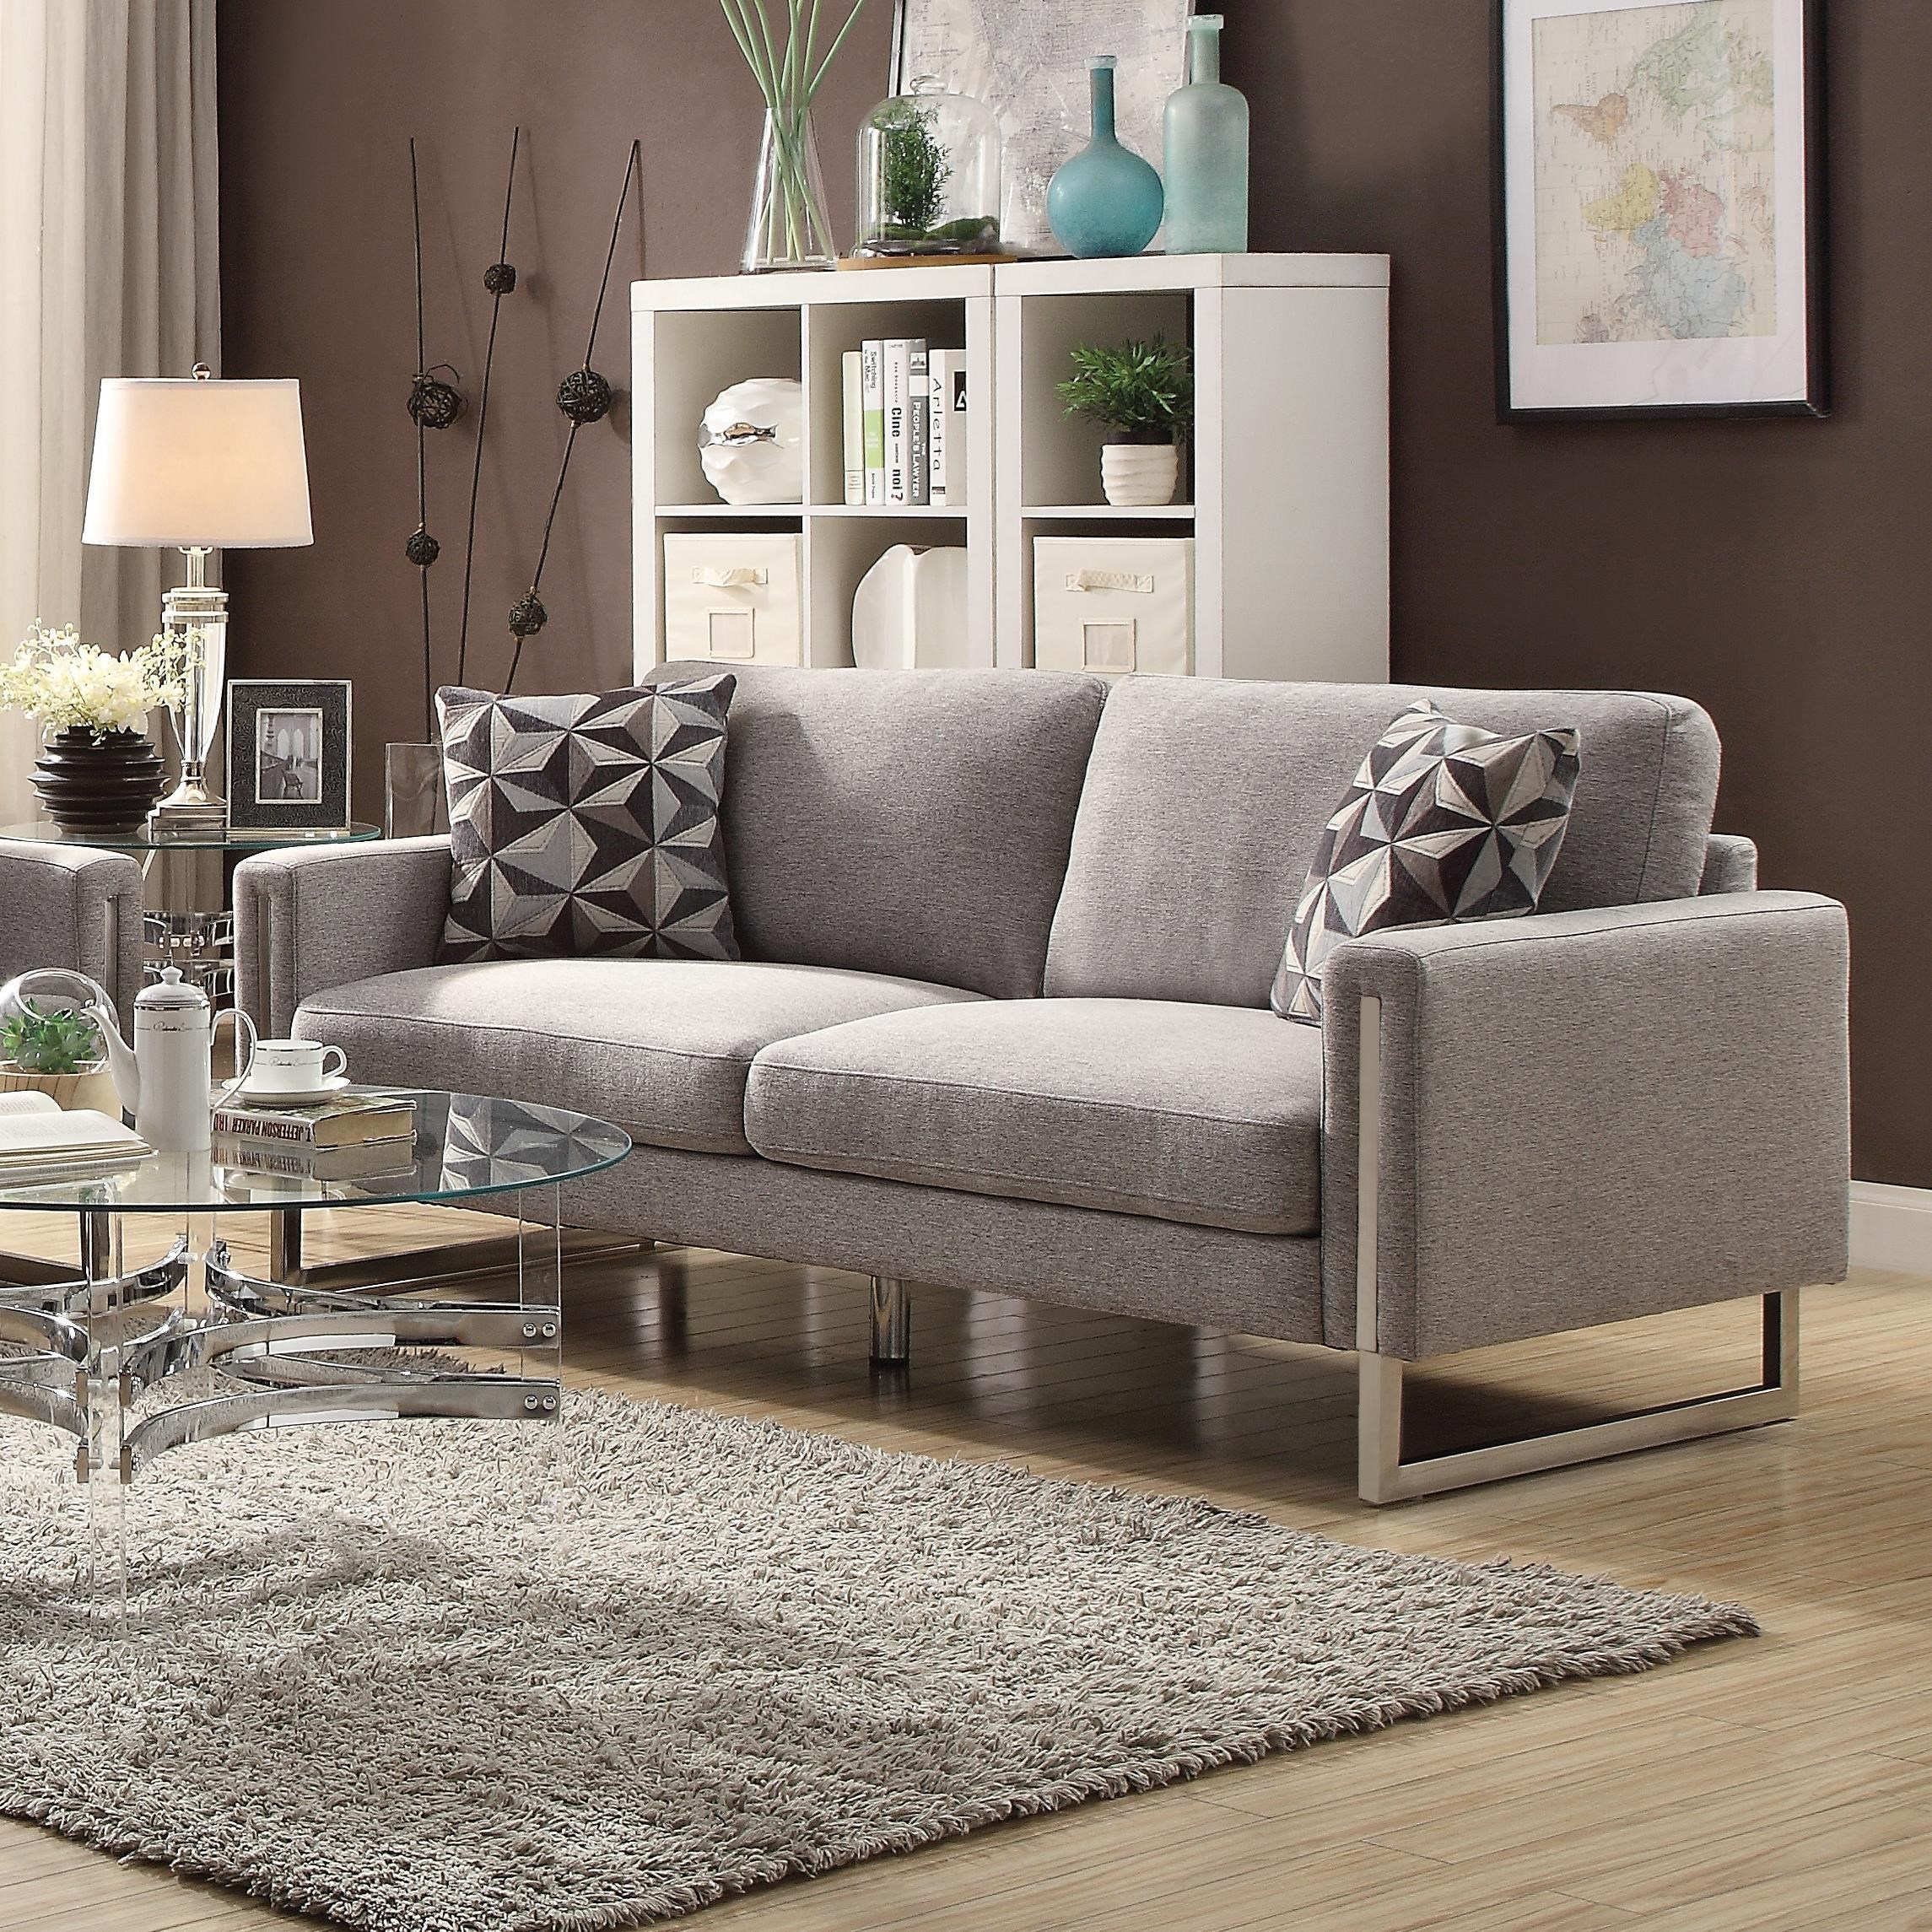 modern sofa dallas bed clearance ex display stellan with u shaped steel legs quality